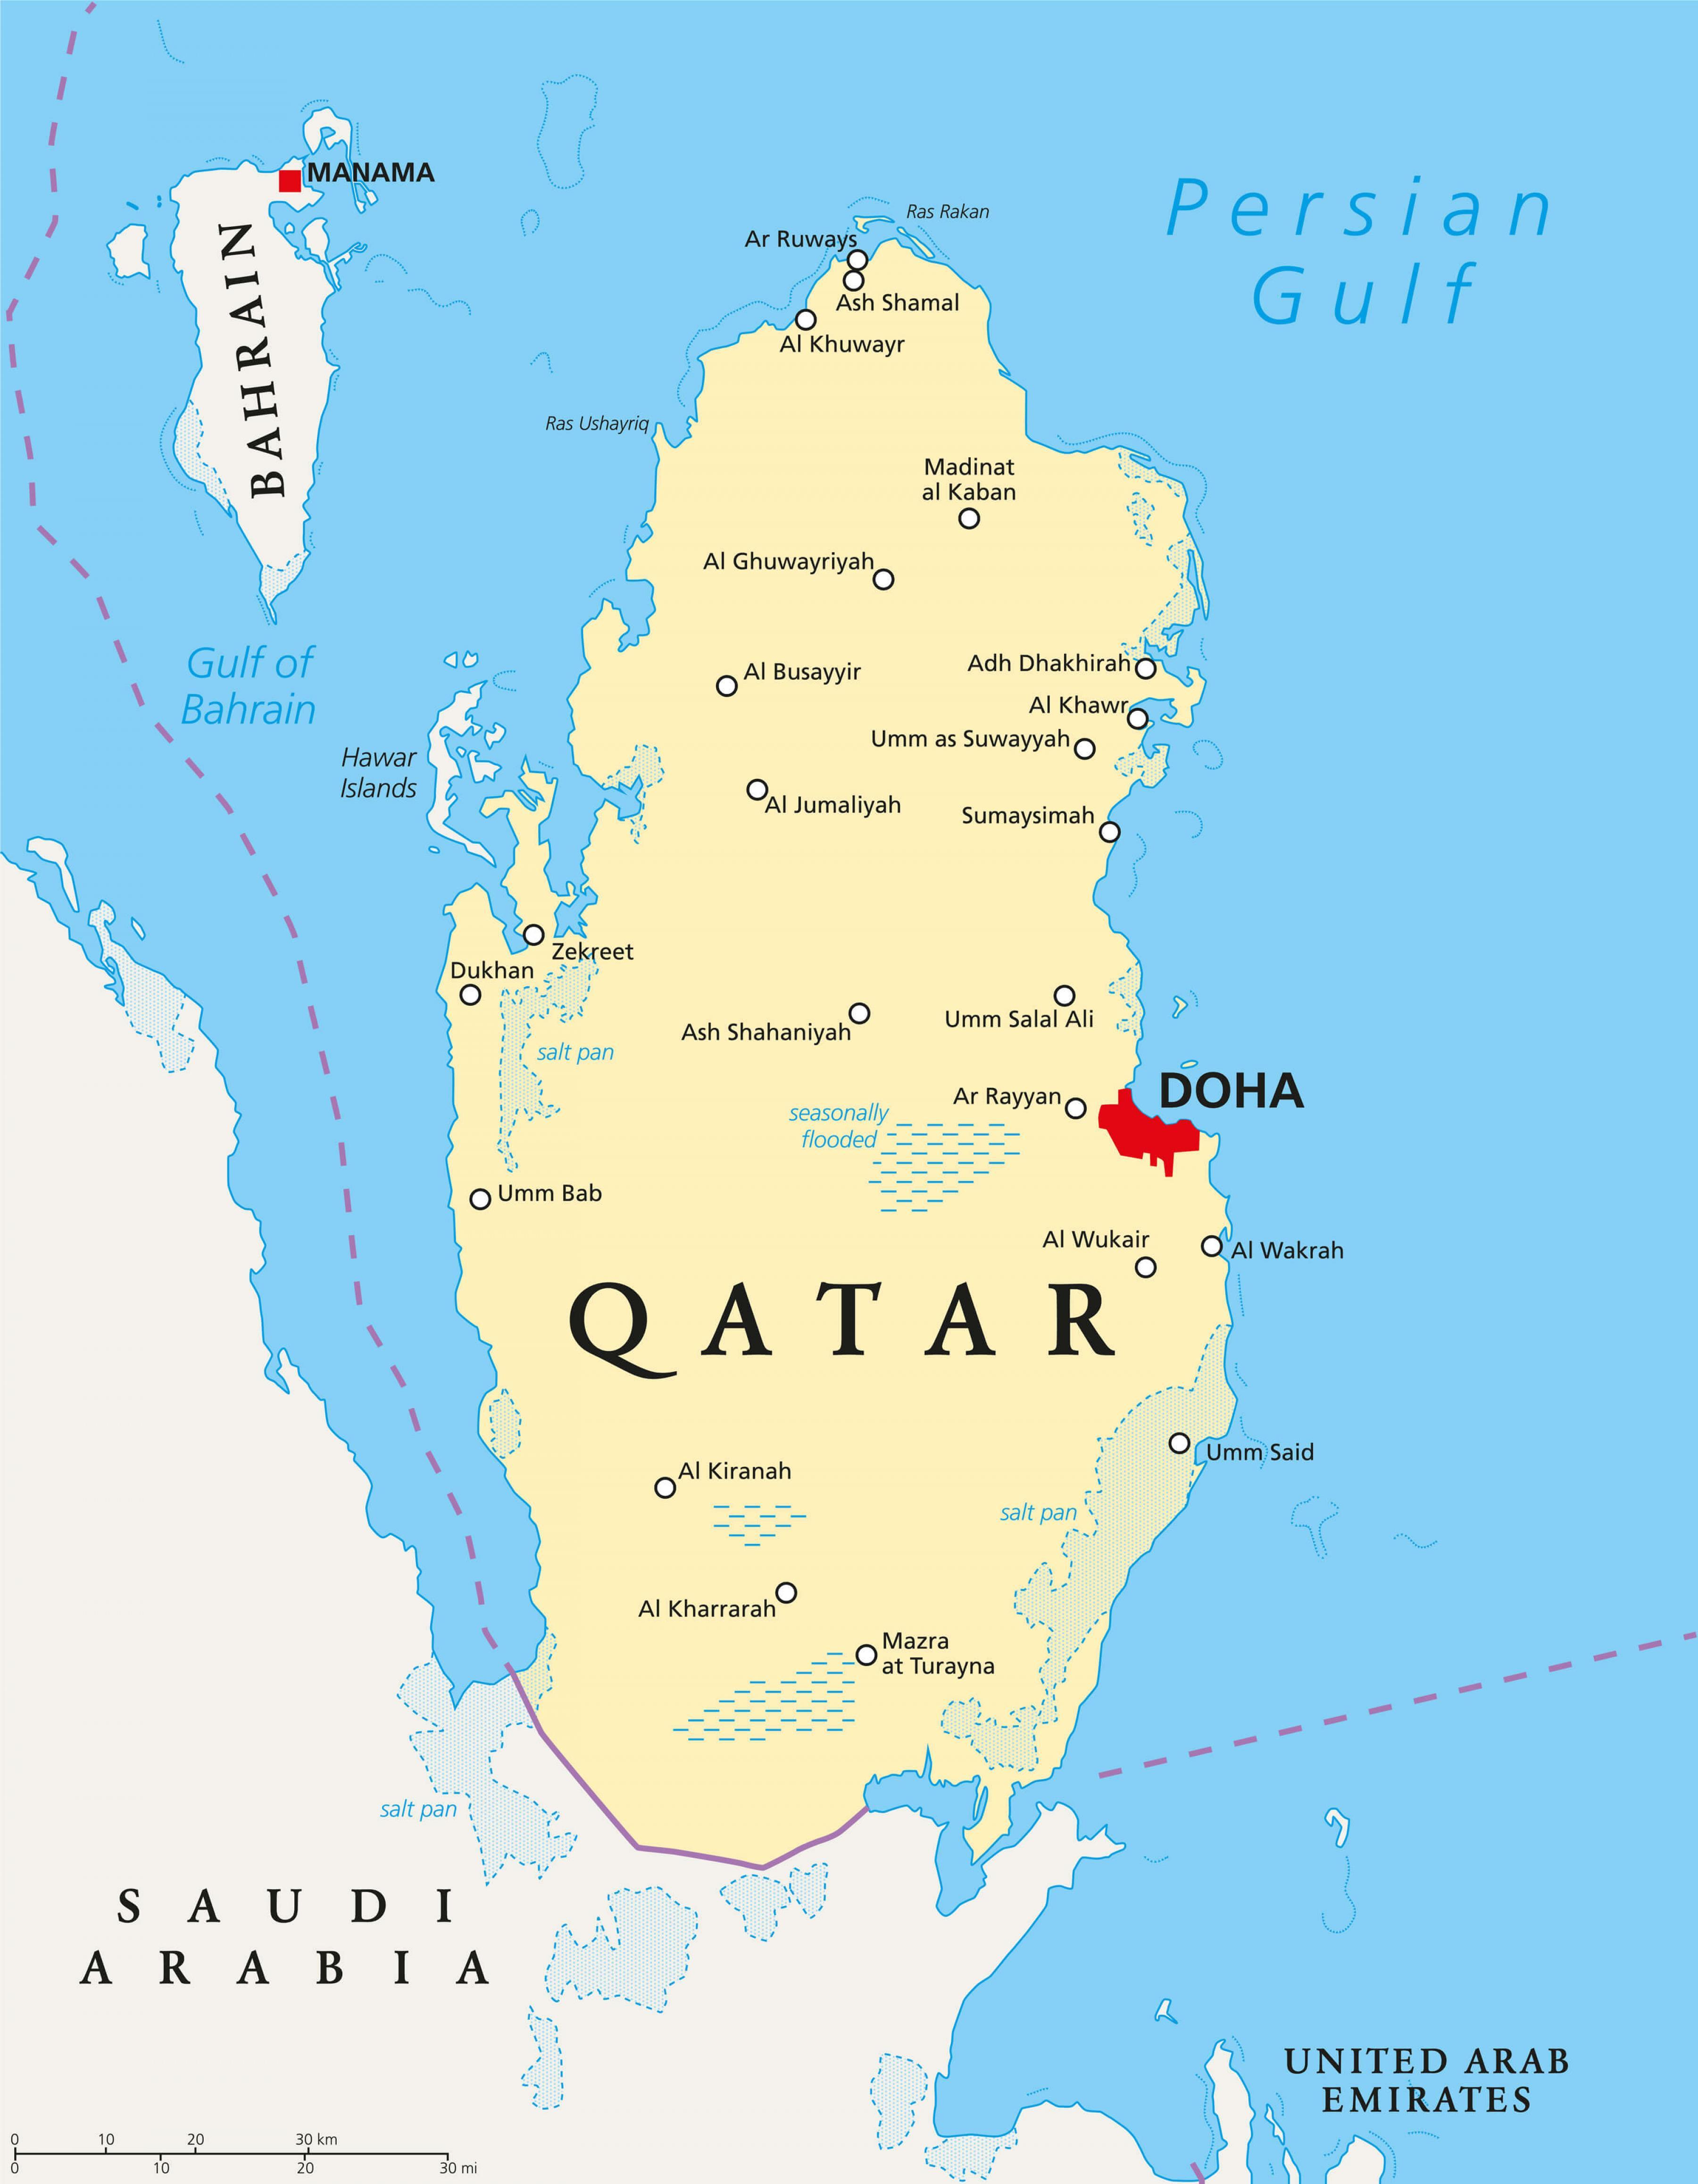 katar térkép Katar városok térkép   Katar térkép városok (Nyugat Ázsia   Asia) katar térkép